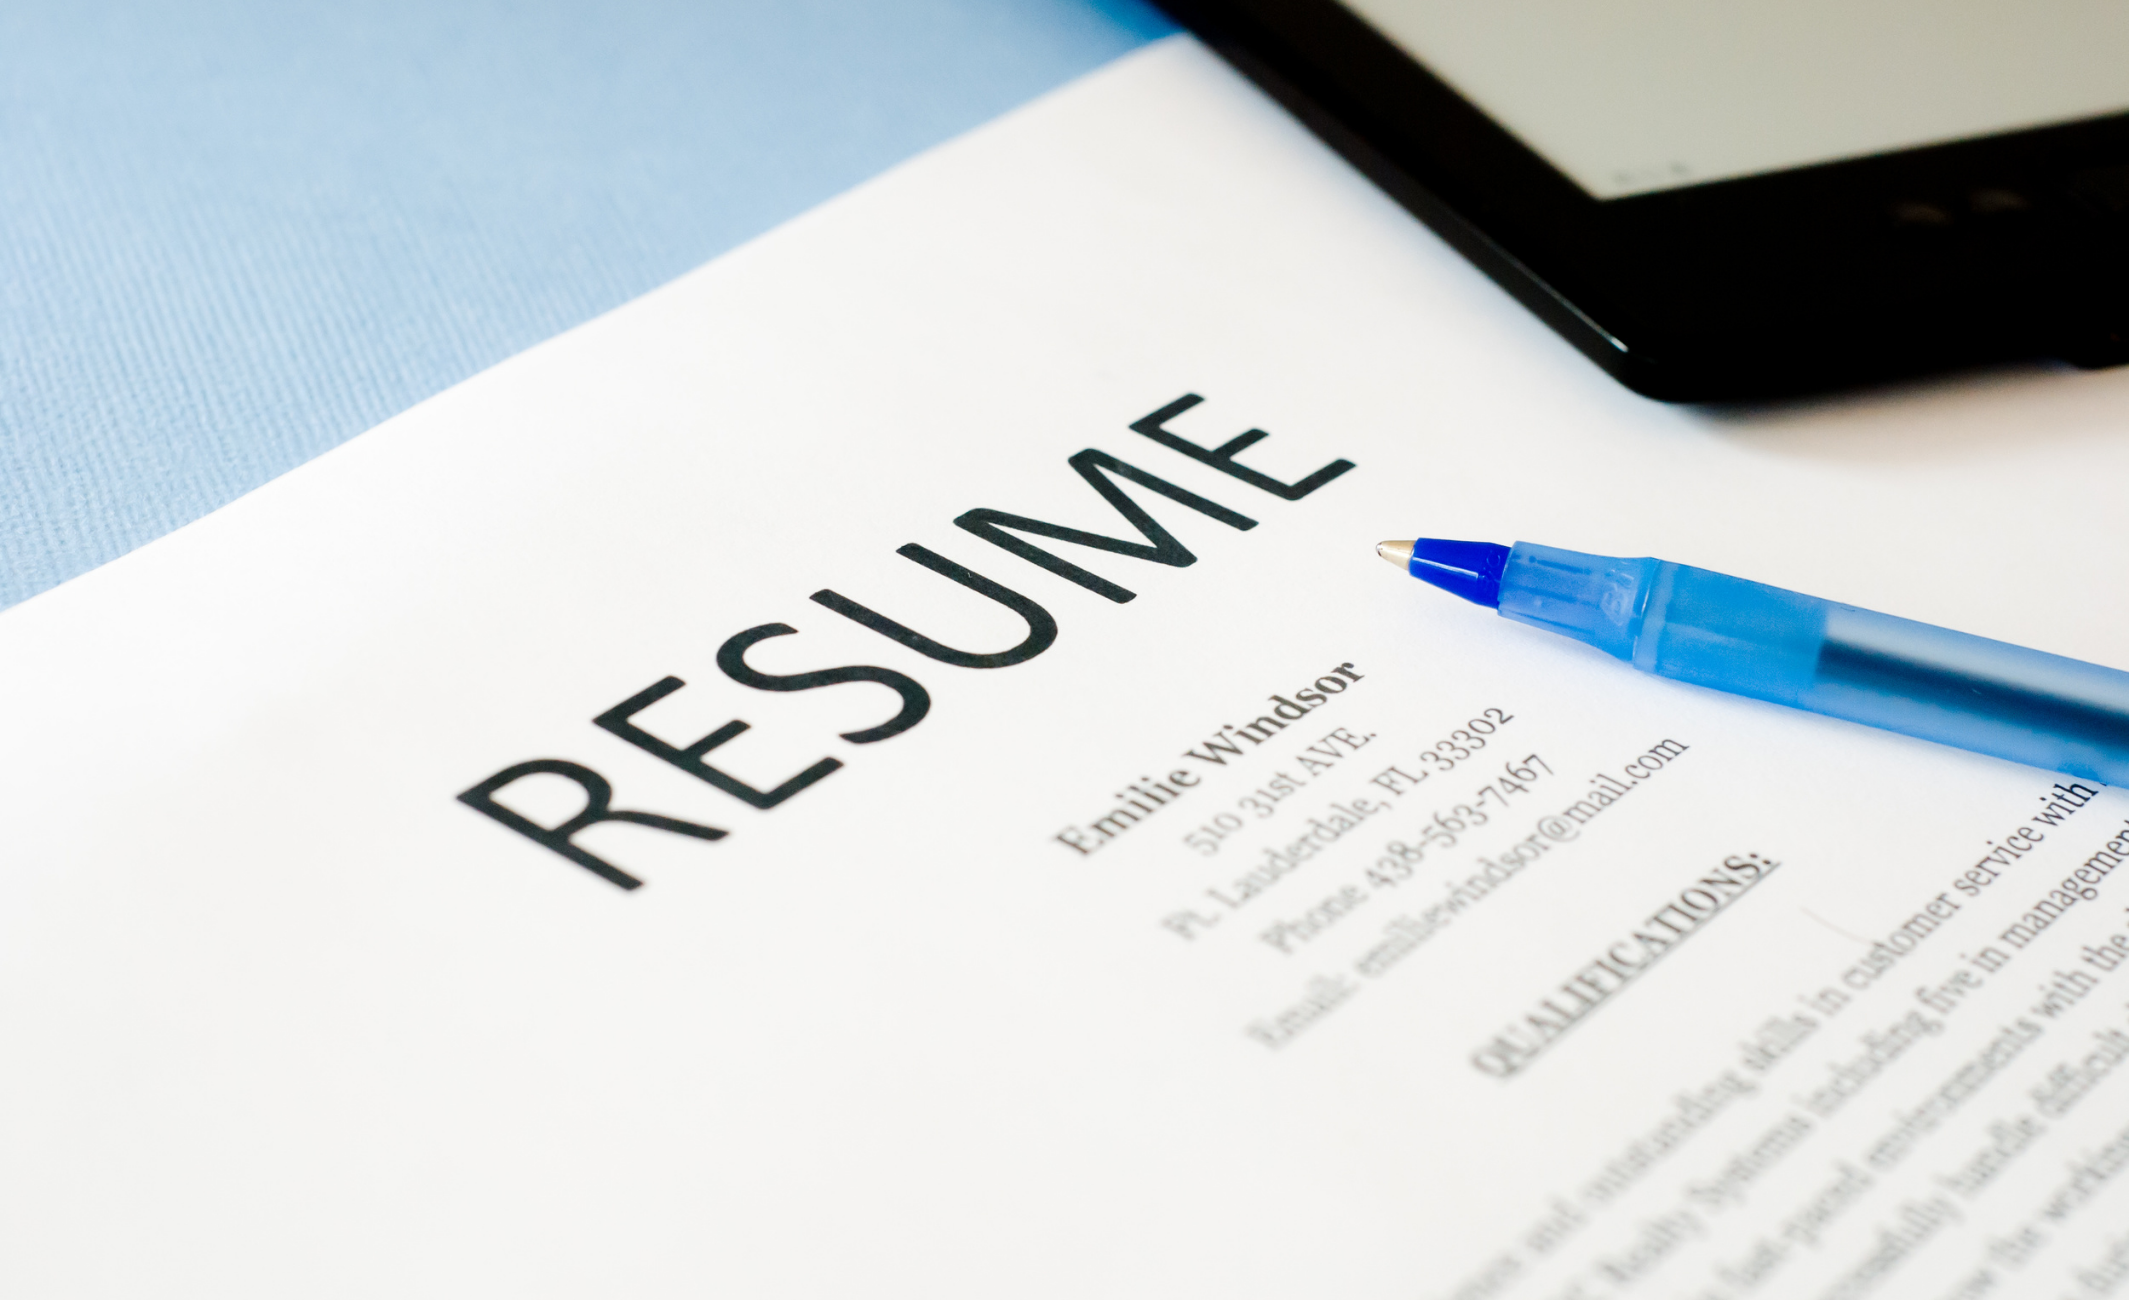 resumehelp_edgilityconsulting_executivesearch